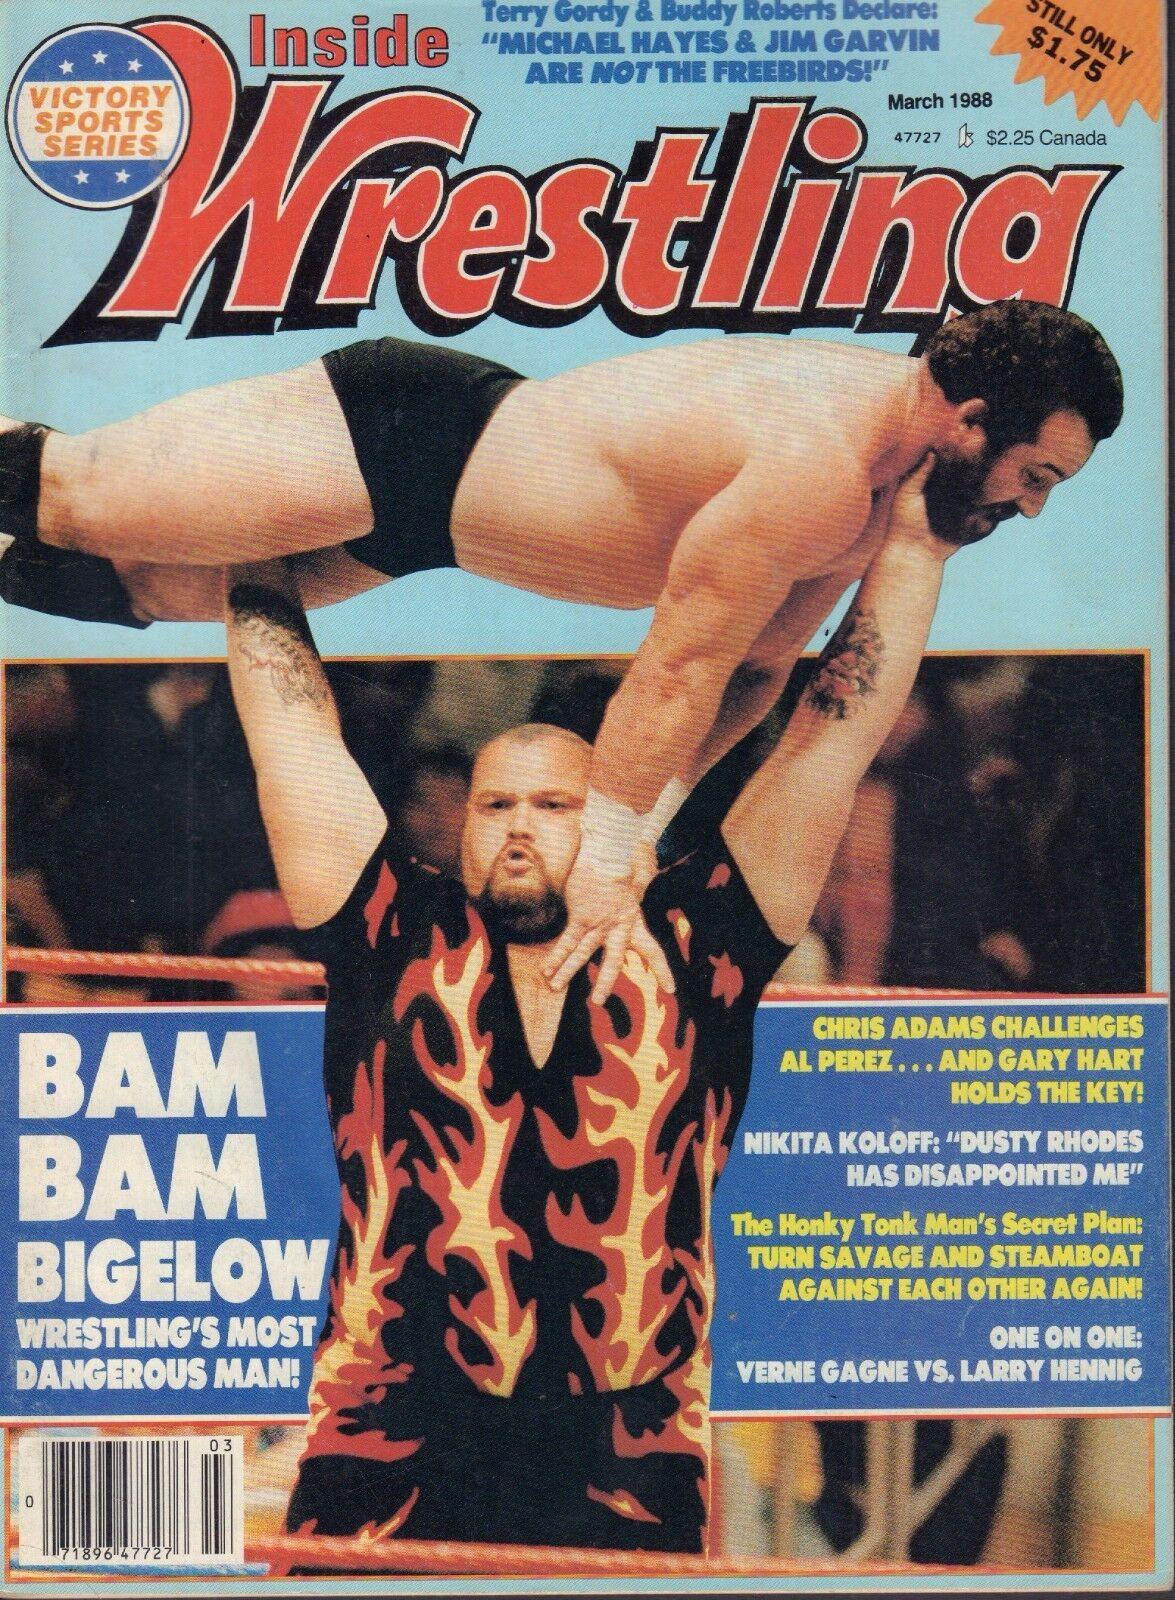 Inside Wrestling - March 1988